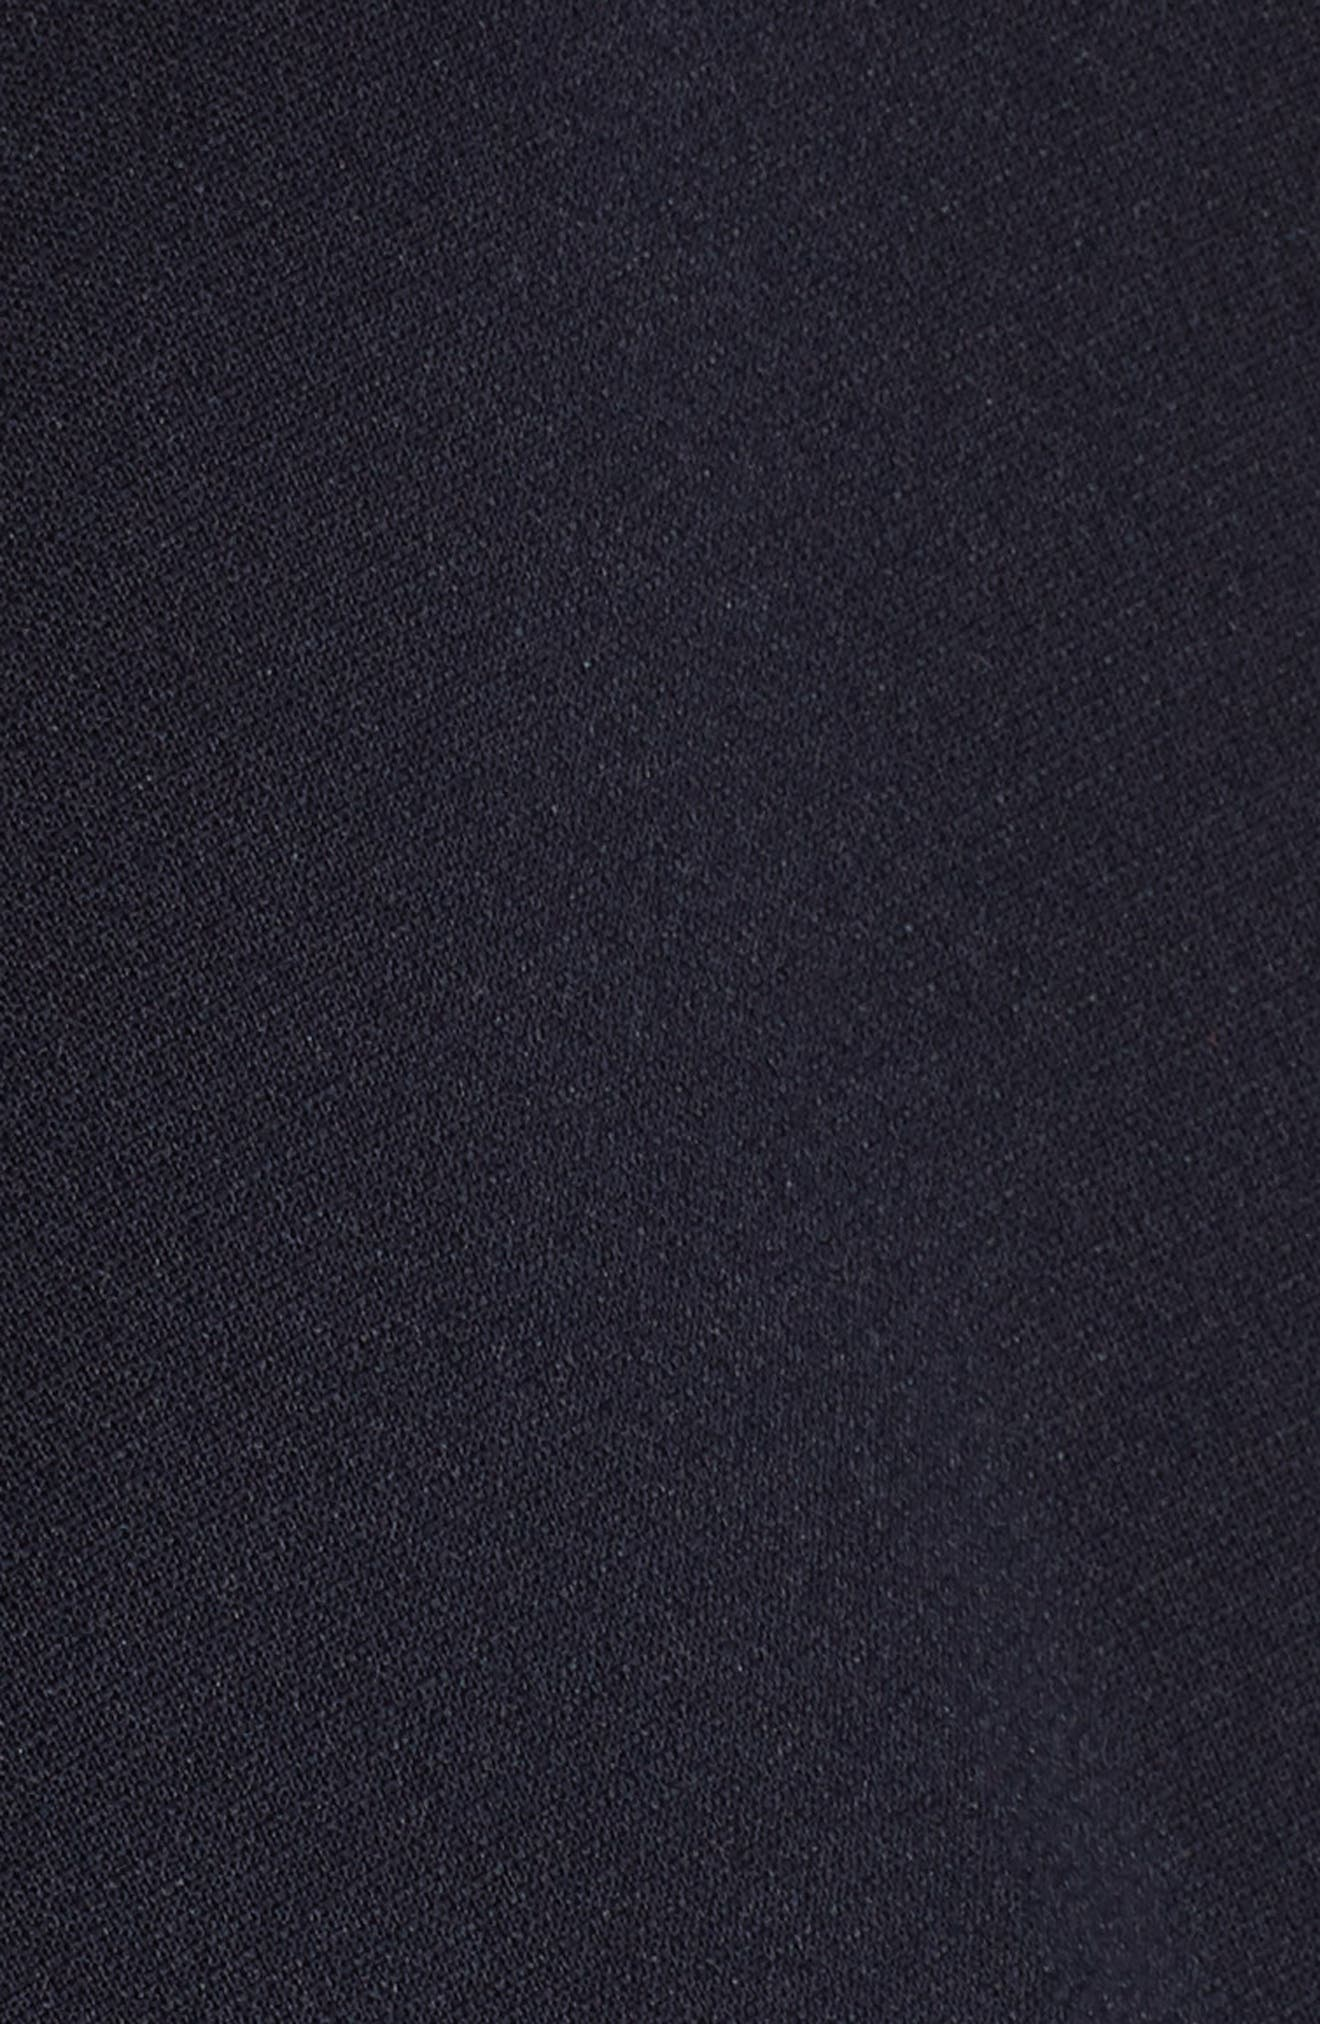 RACHEL GILBERT,                             Farah Peplum Dress,                             Alternate thumbnail 5, color,                             495